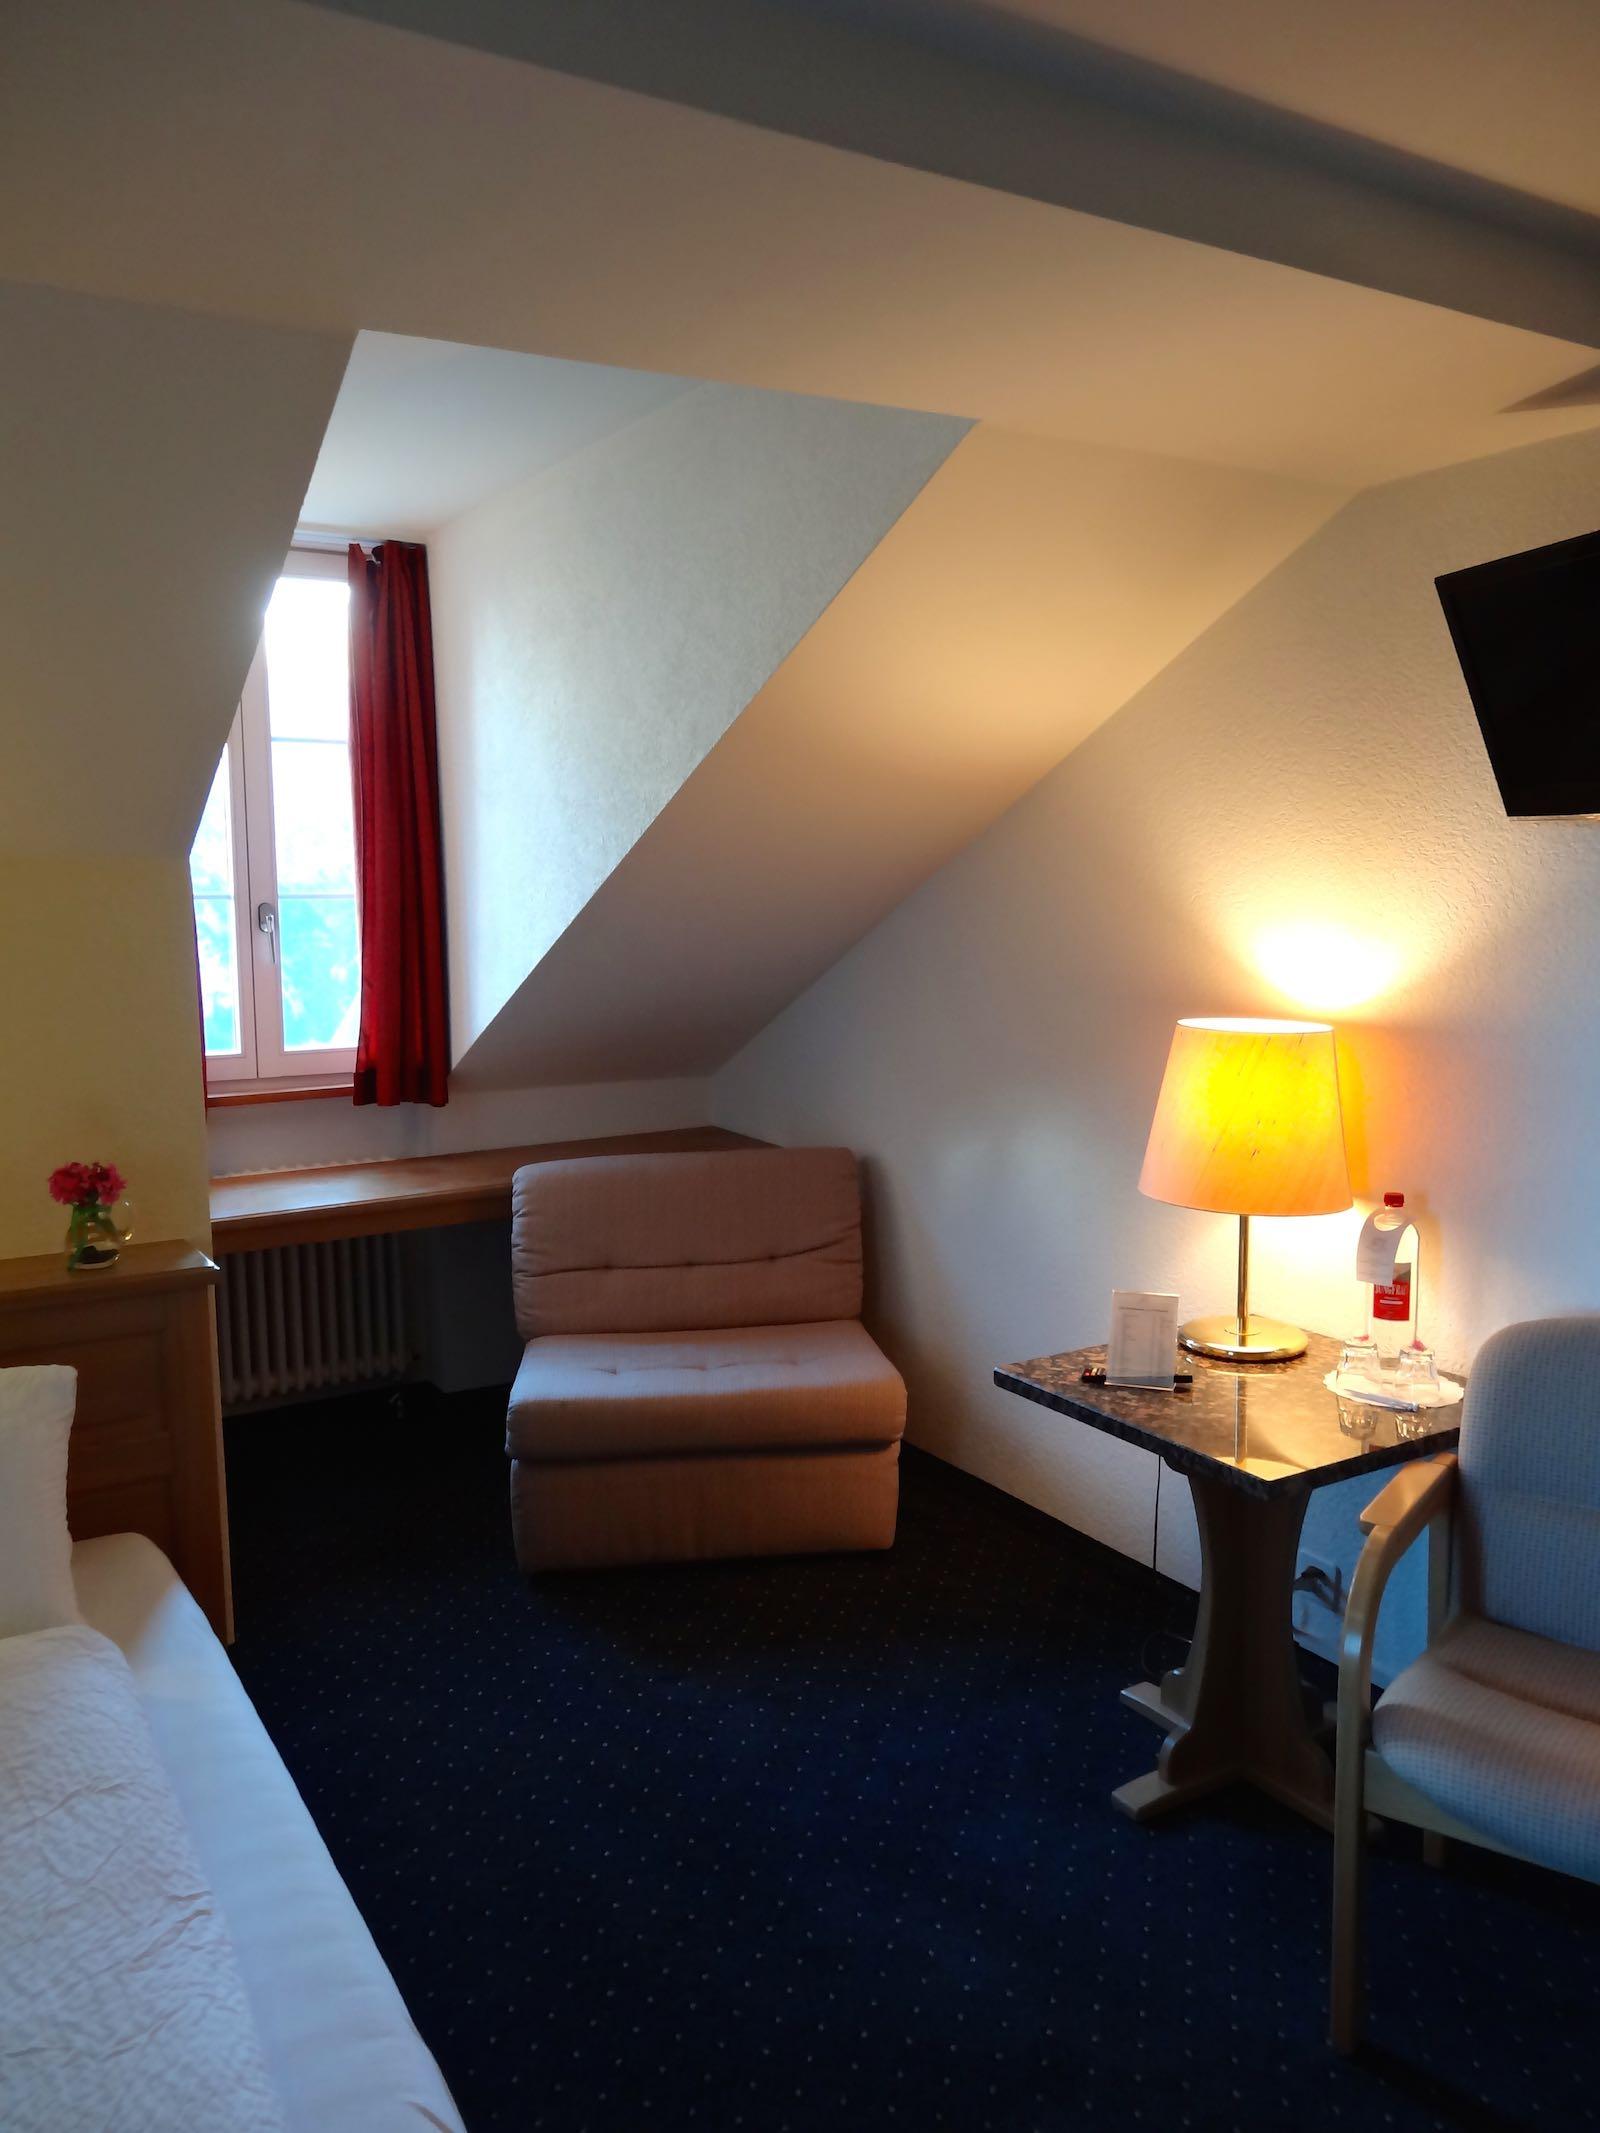 http://hoteljungfrau.ch/wp-content/uploads/2014/09/economy-zimmer-3.jpg